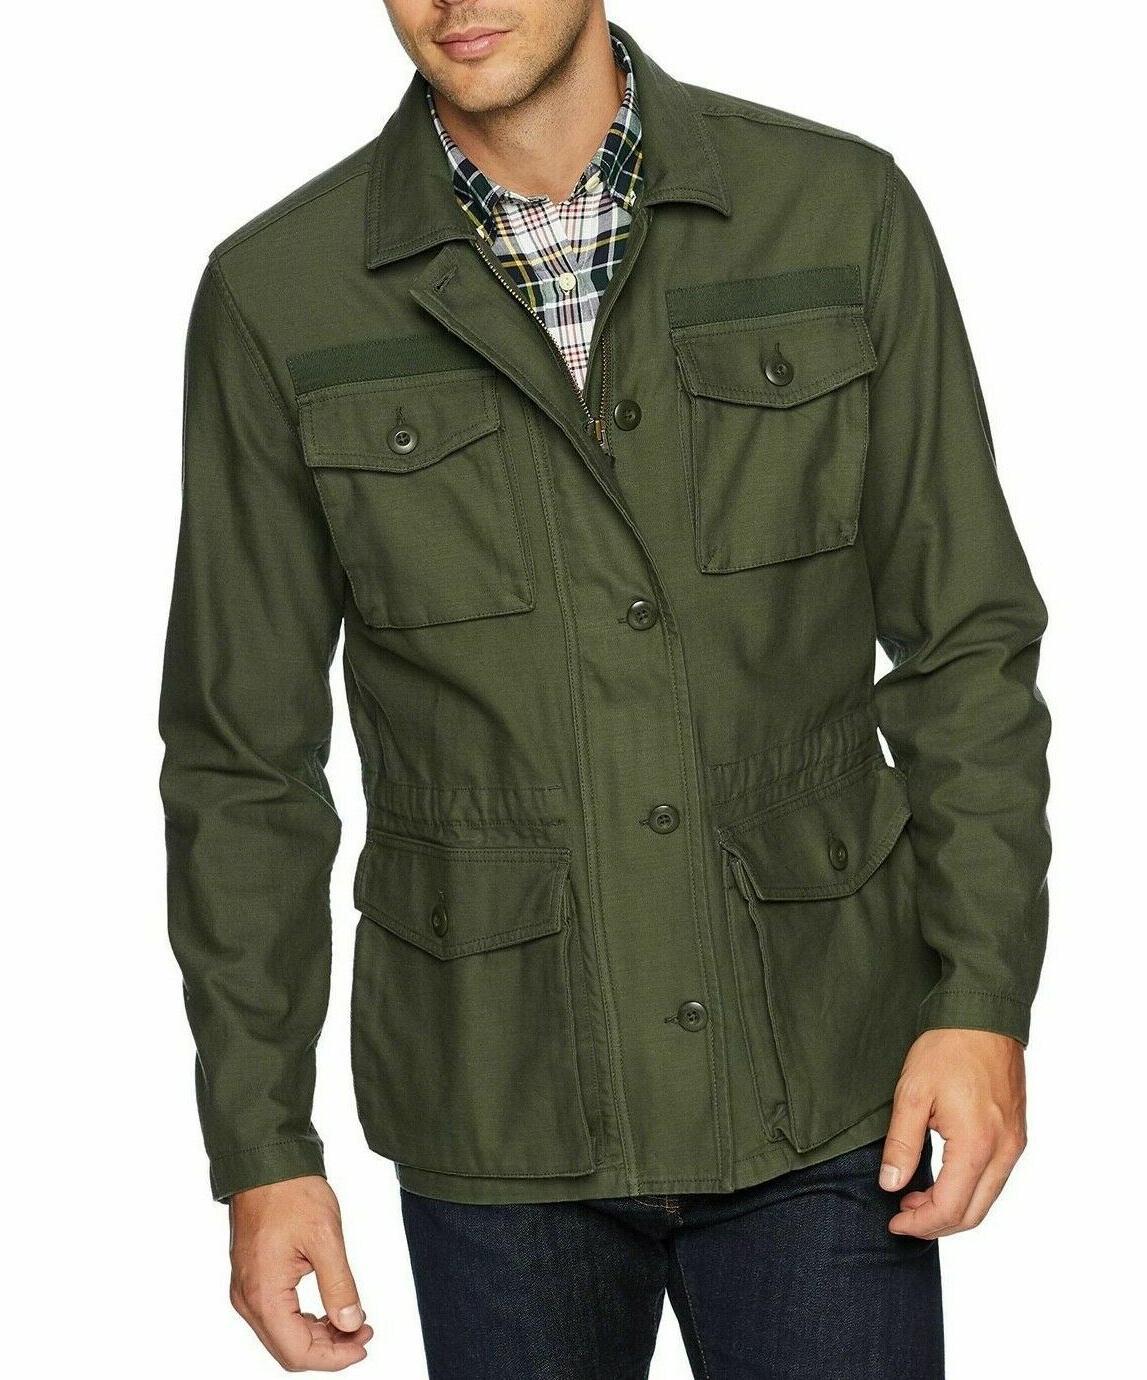 mens military jacket 4 pocket deep depth